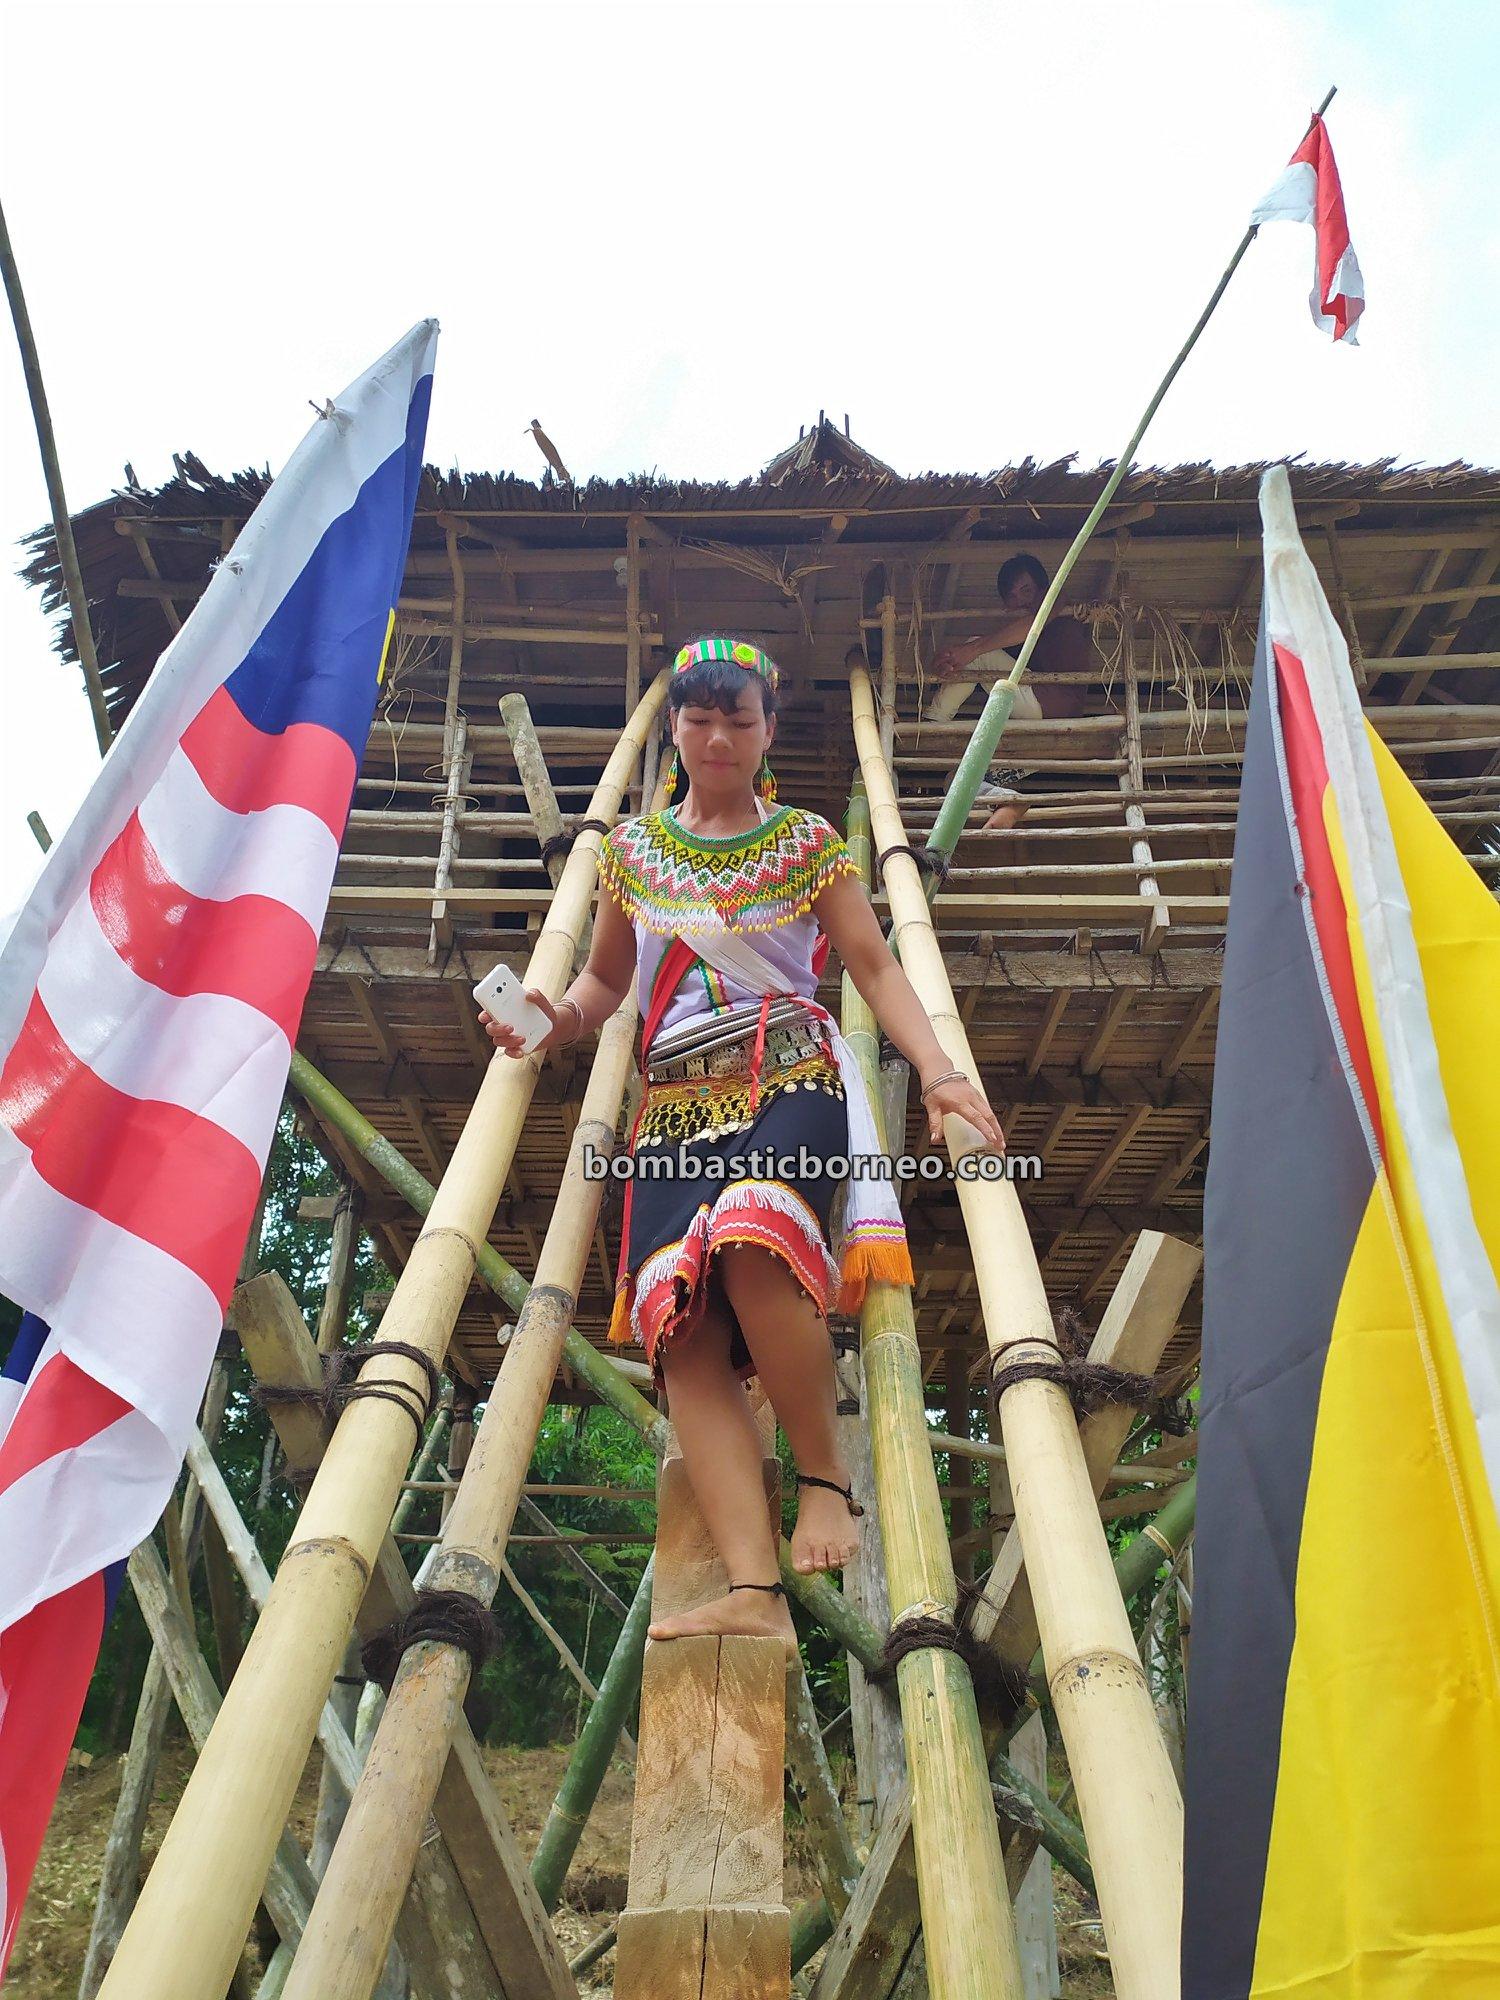 nyobeng, Dusun Medeng, traditional, culture, Bengkayang, native, tribe, highland, village, Obyek wisata, Tourism, travel guide, Borneo, 印尼西加里曼丹, 原住民丰收节日,